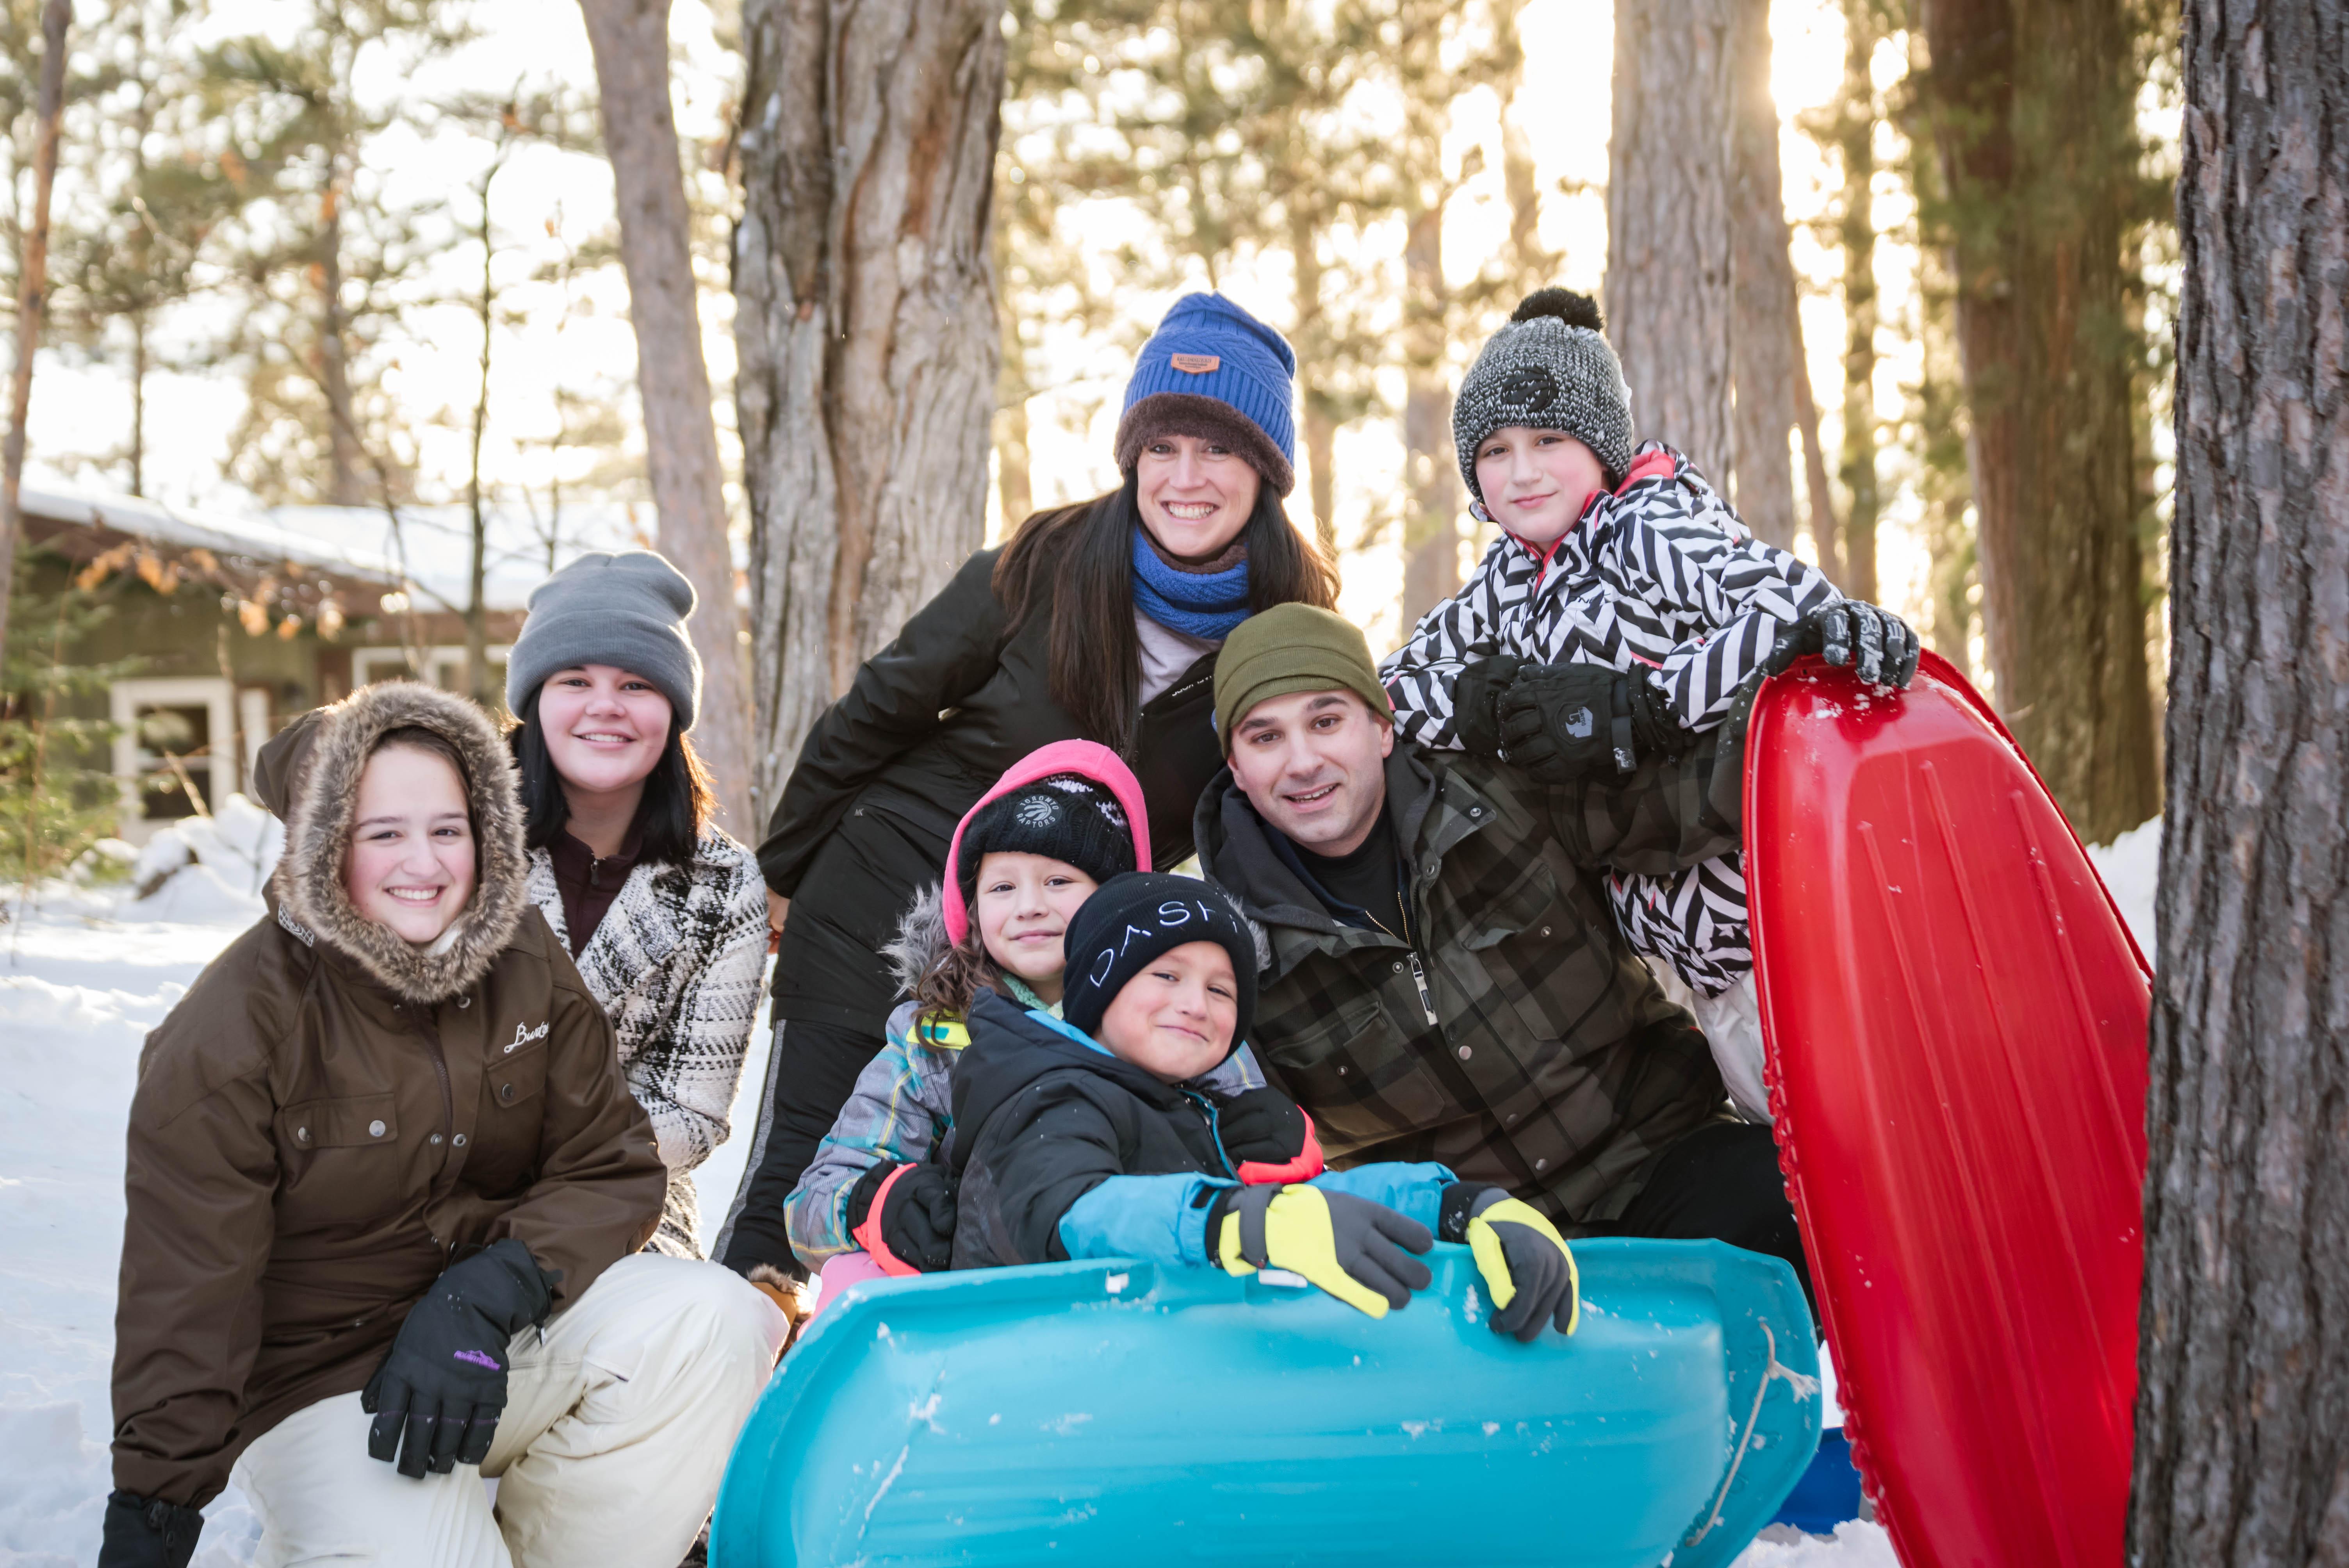 family enjoys time sledding together in dollar bay mi